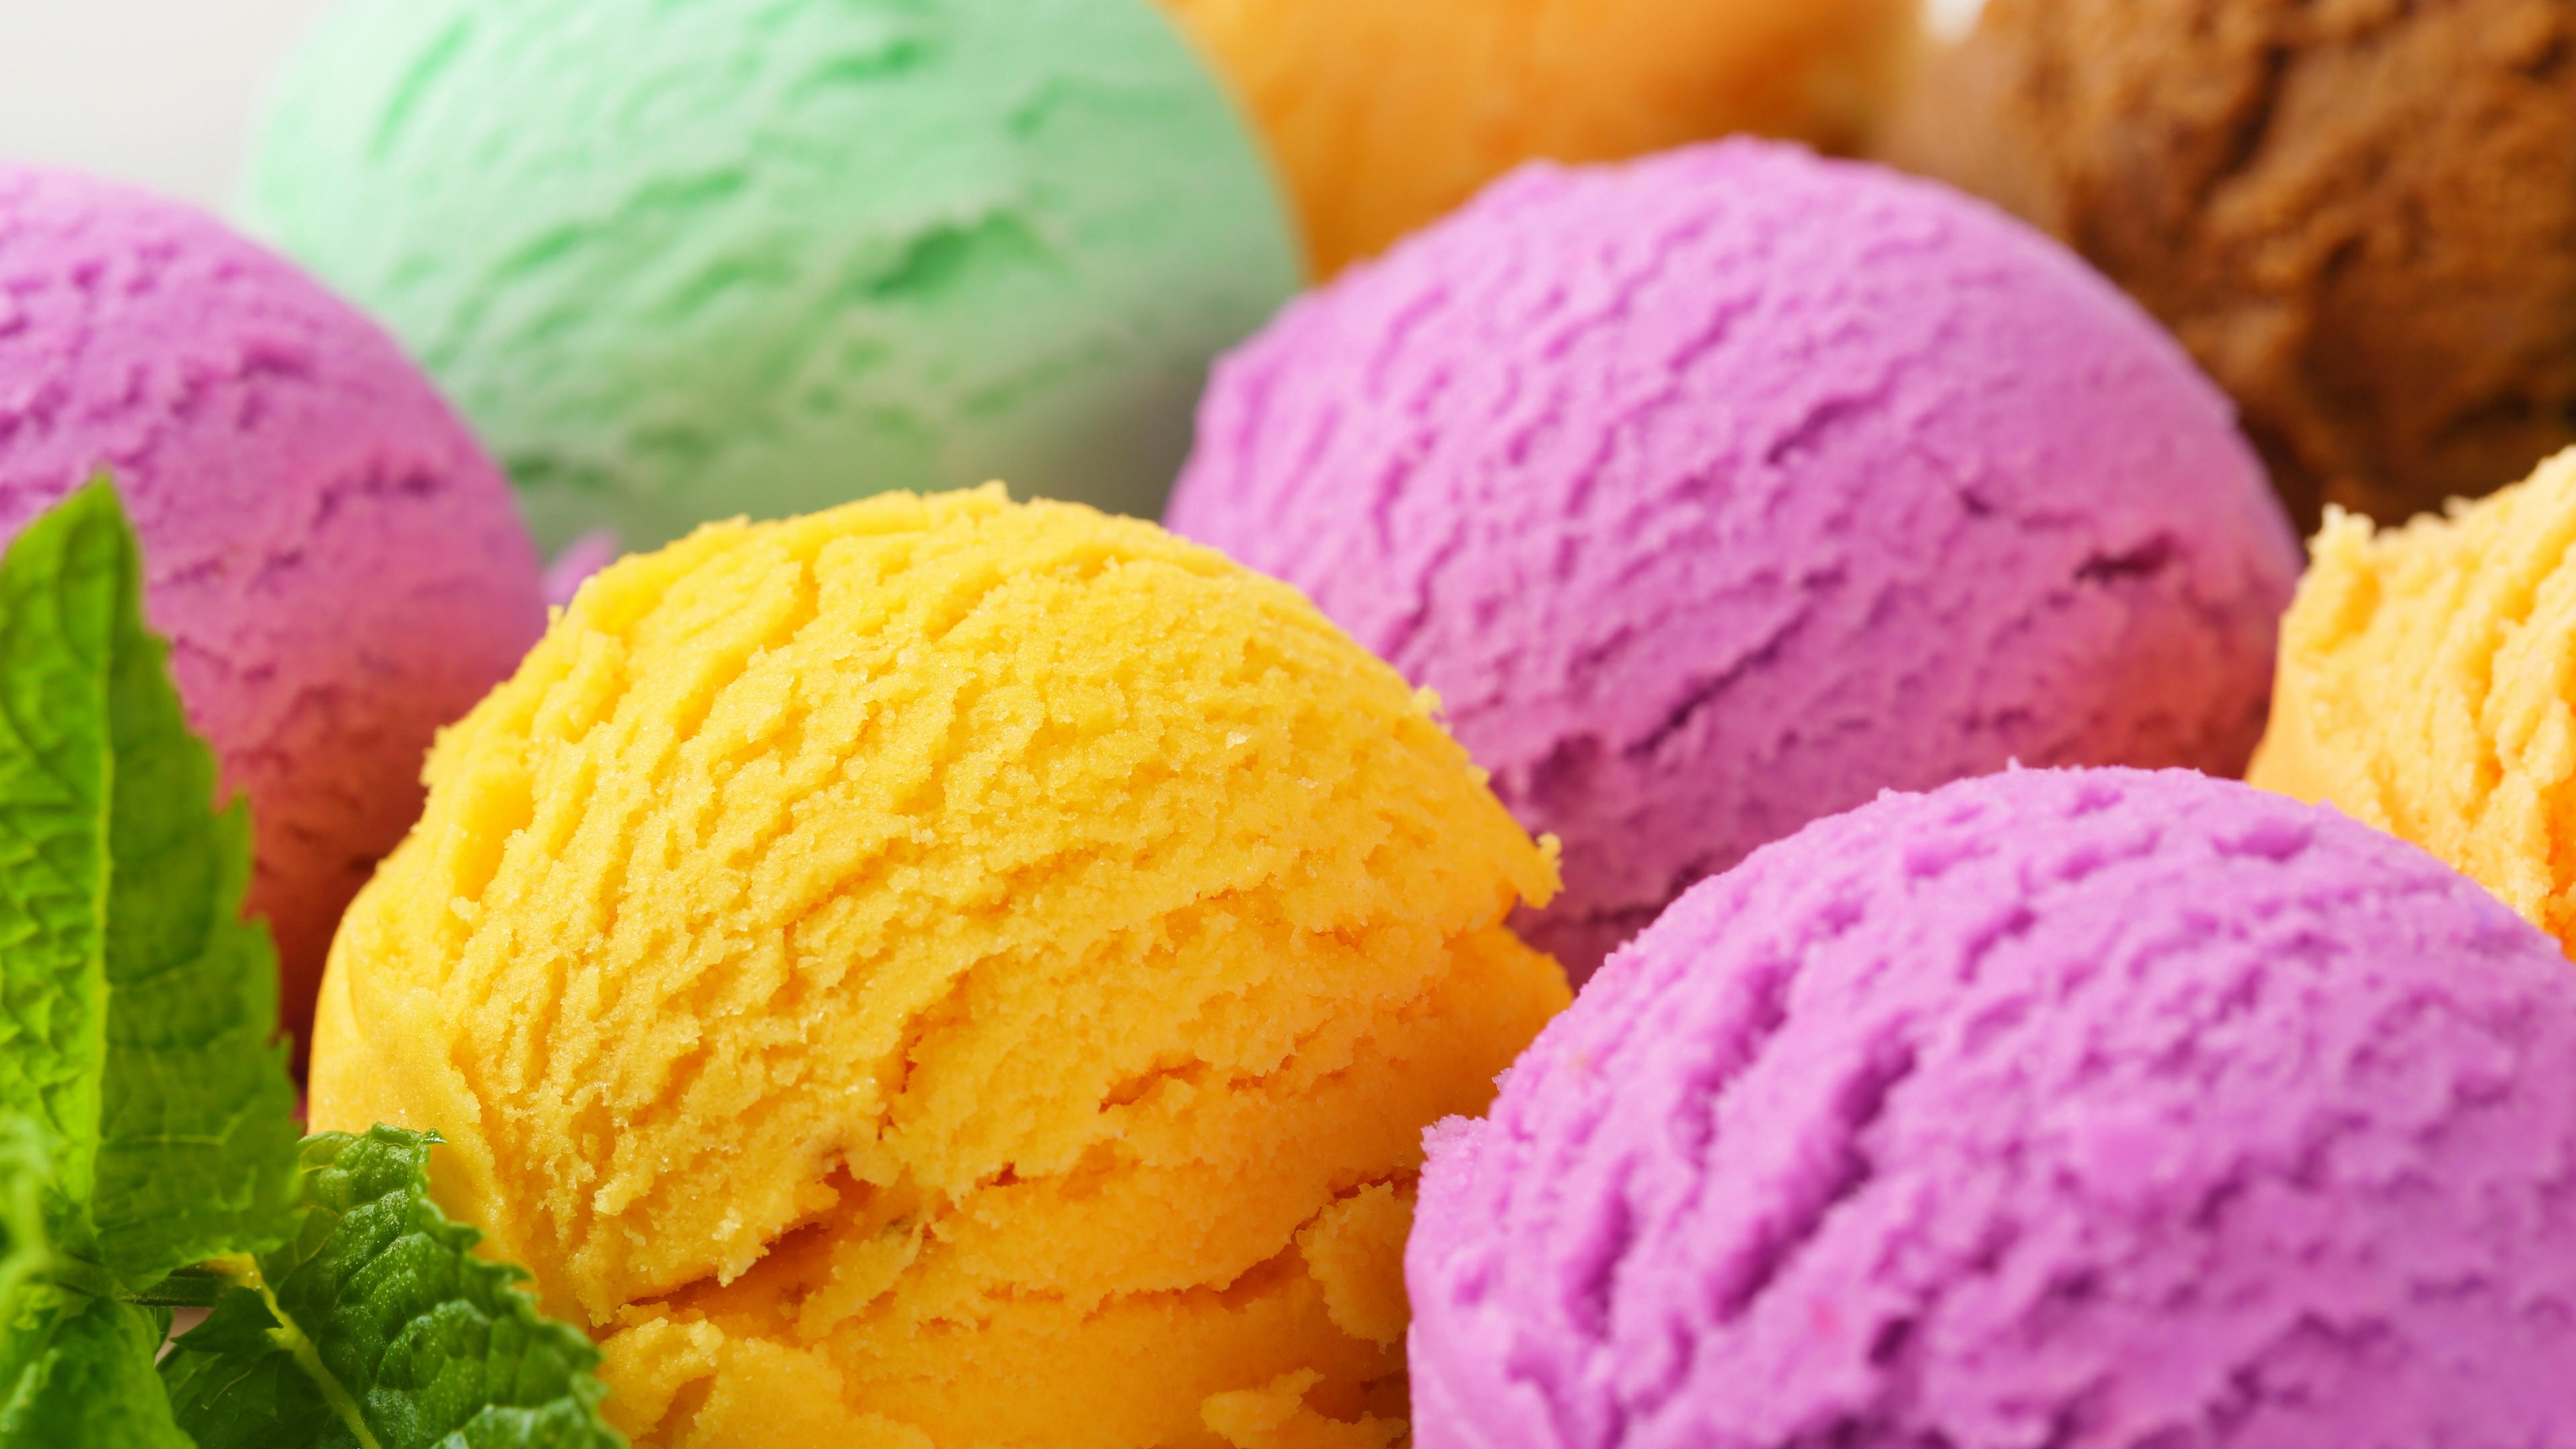 мороженое цветное ice cream color онлайн